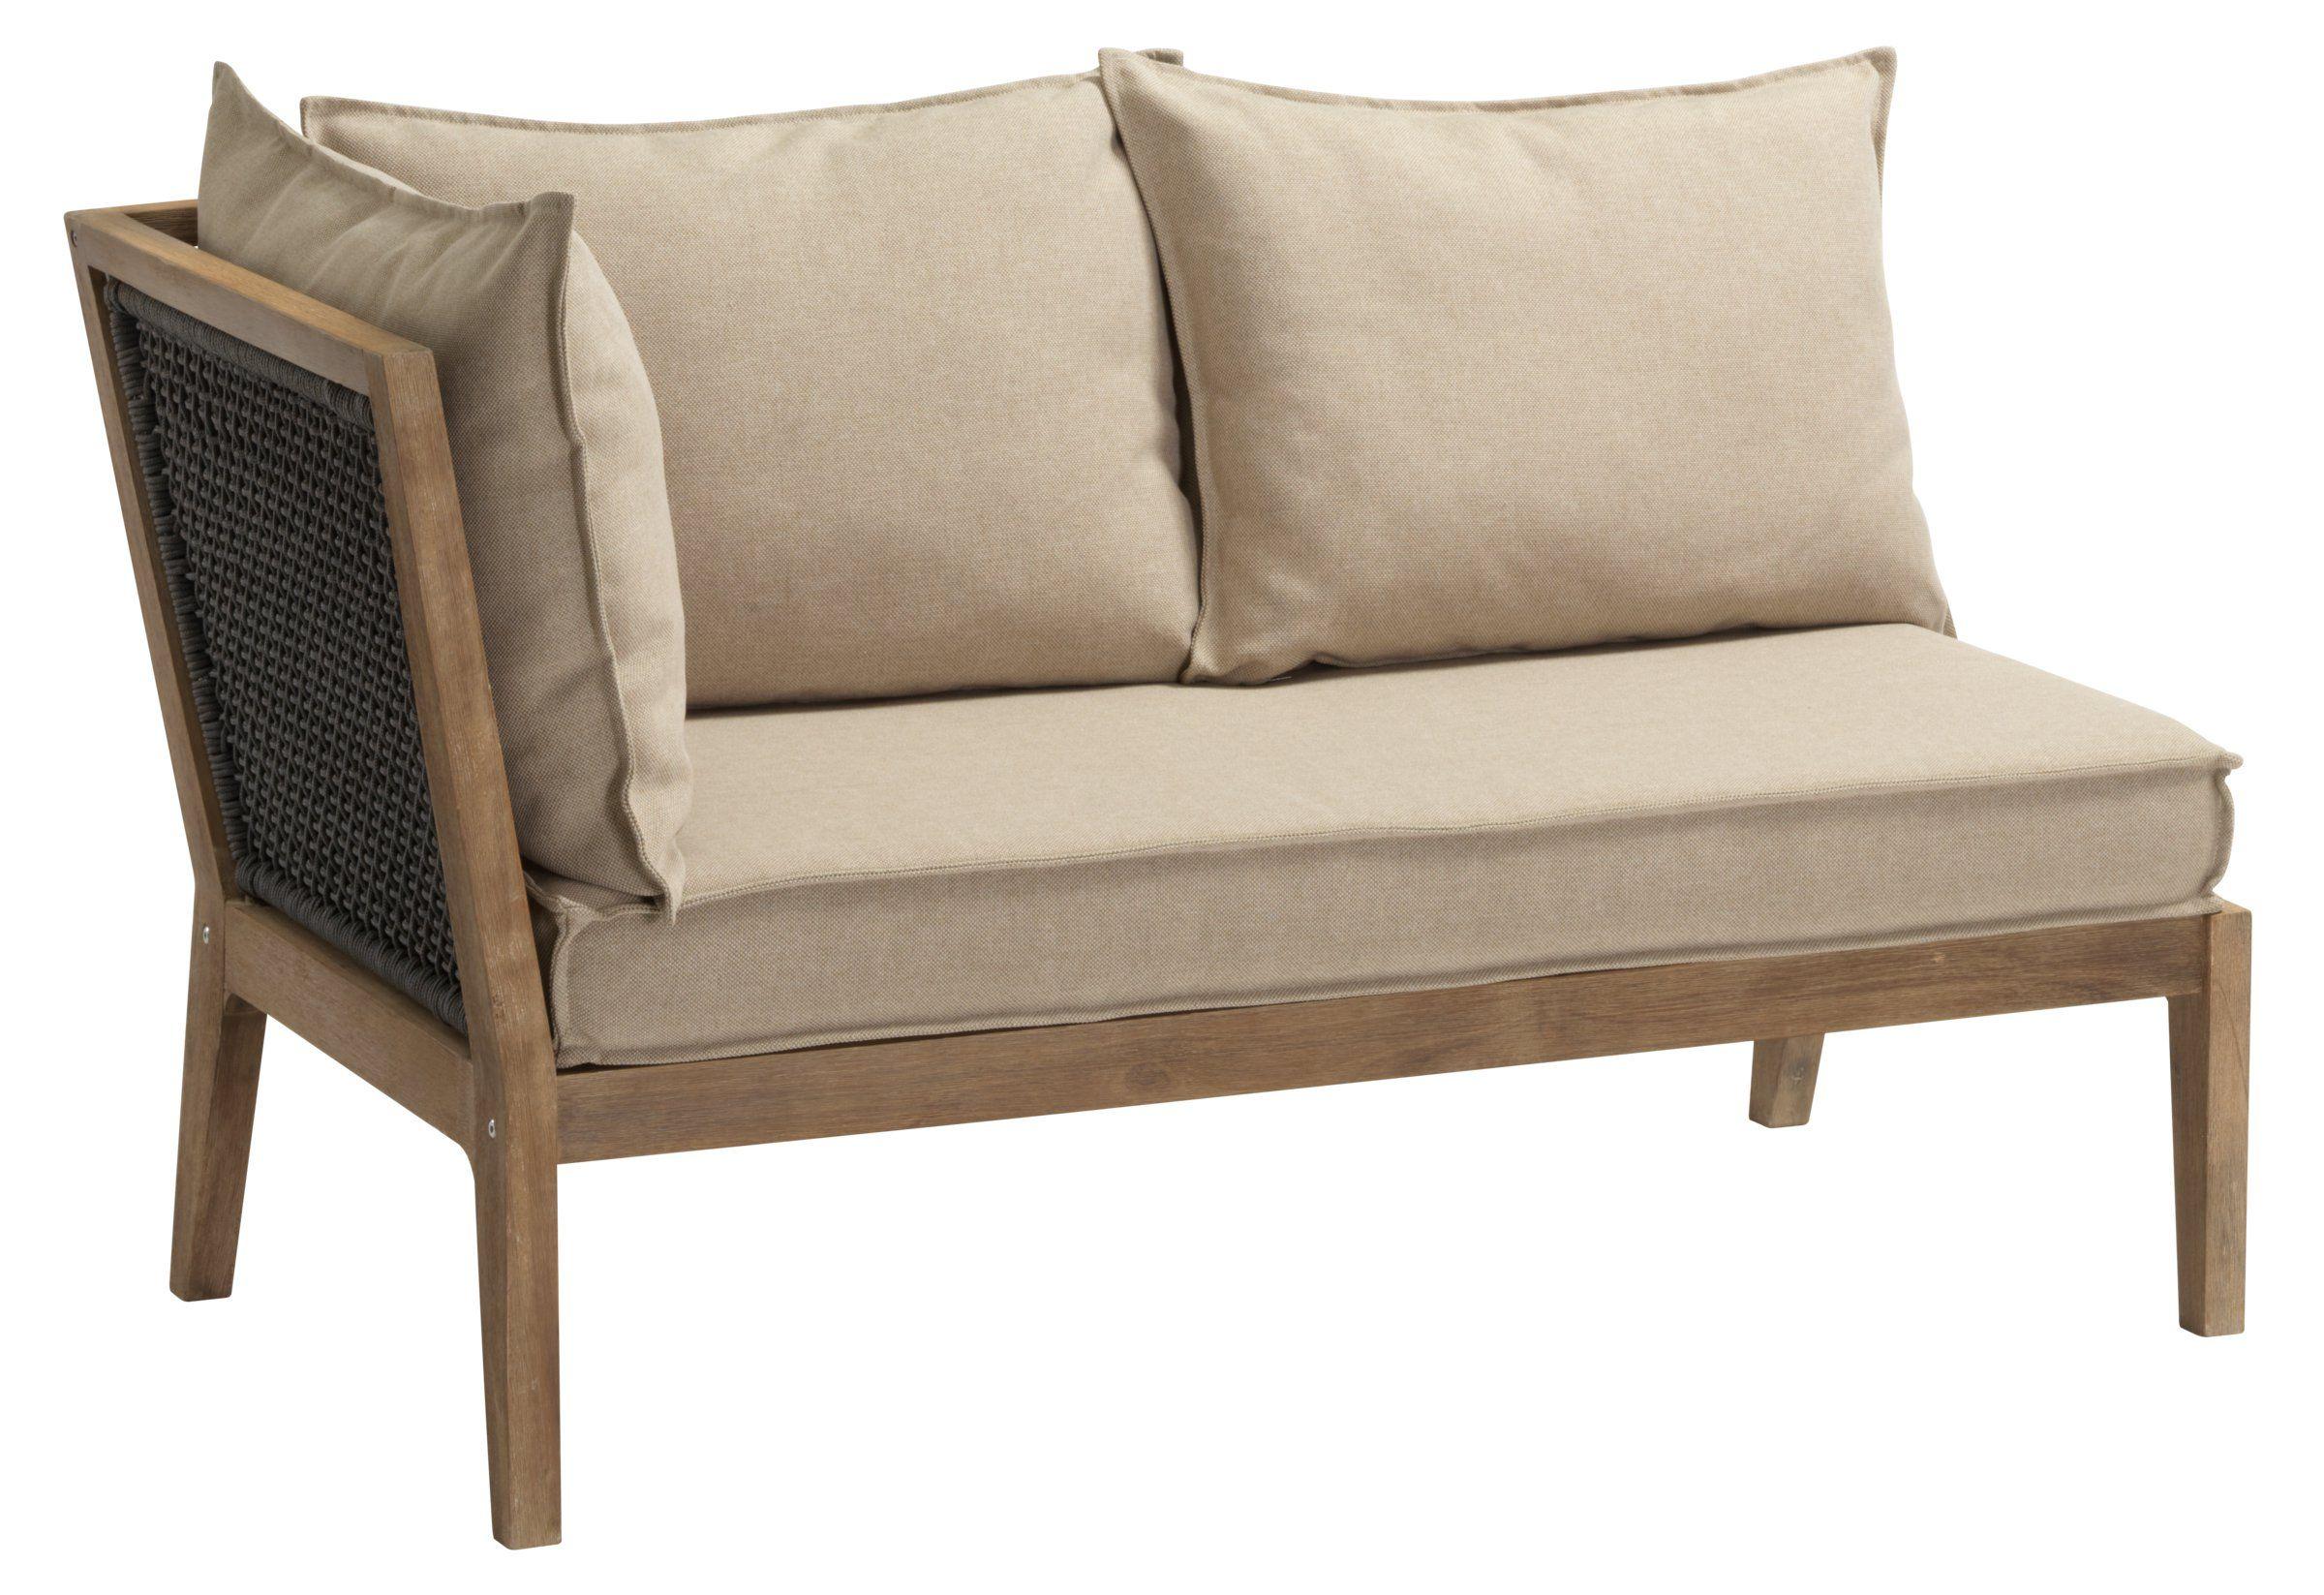 Lounge Sofa Rechts Cape Cod Inkl 4 Kissen Beige Mit Bildern